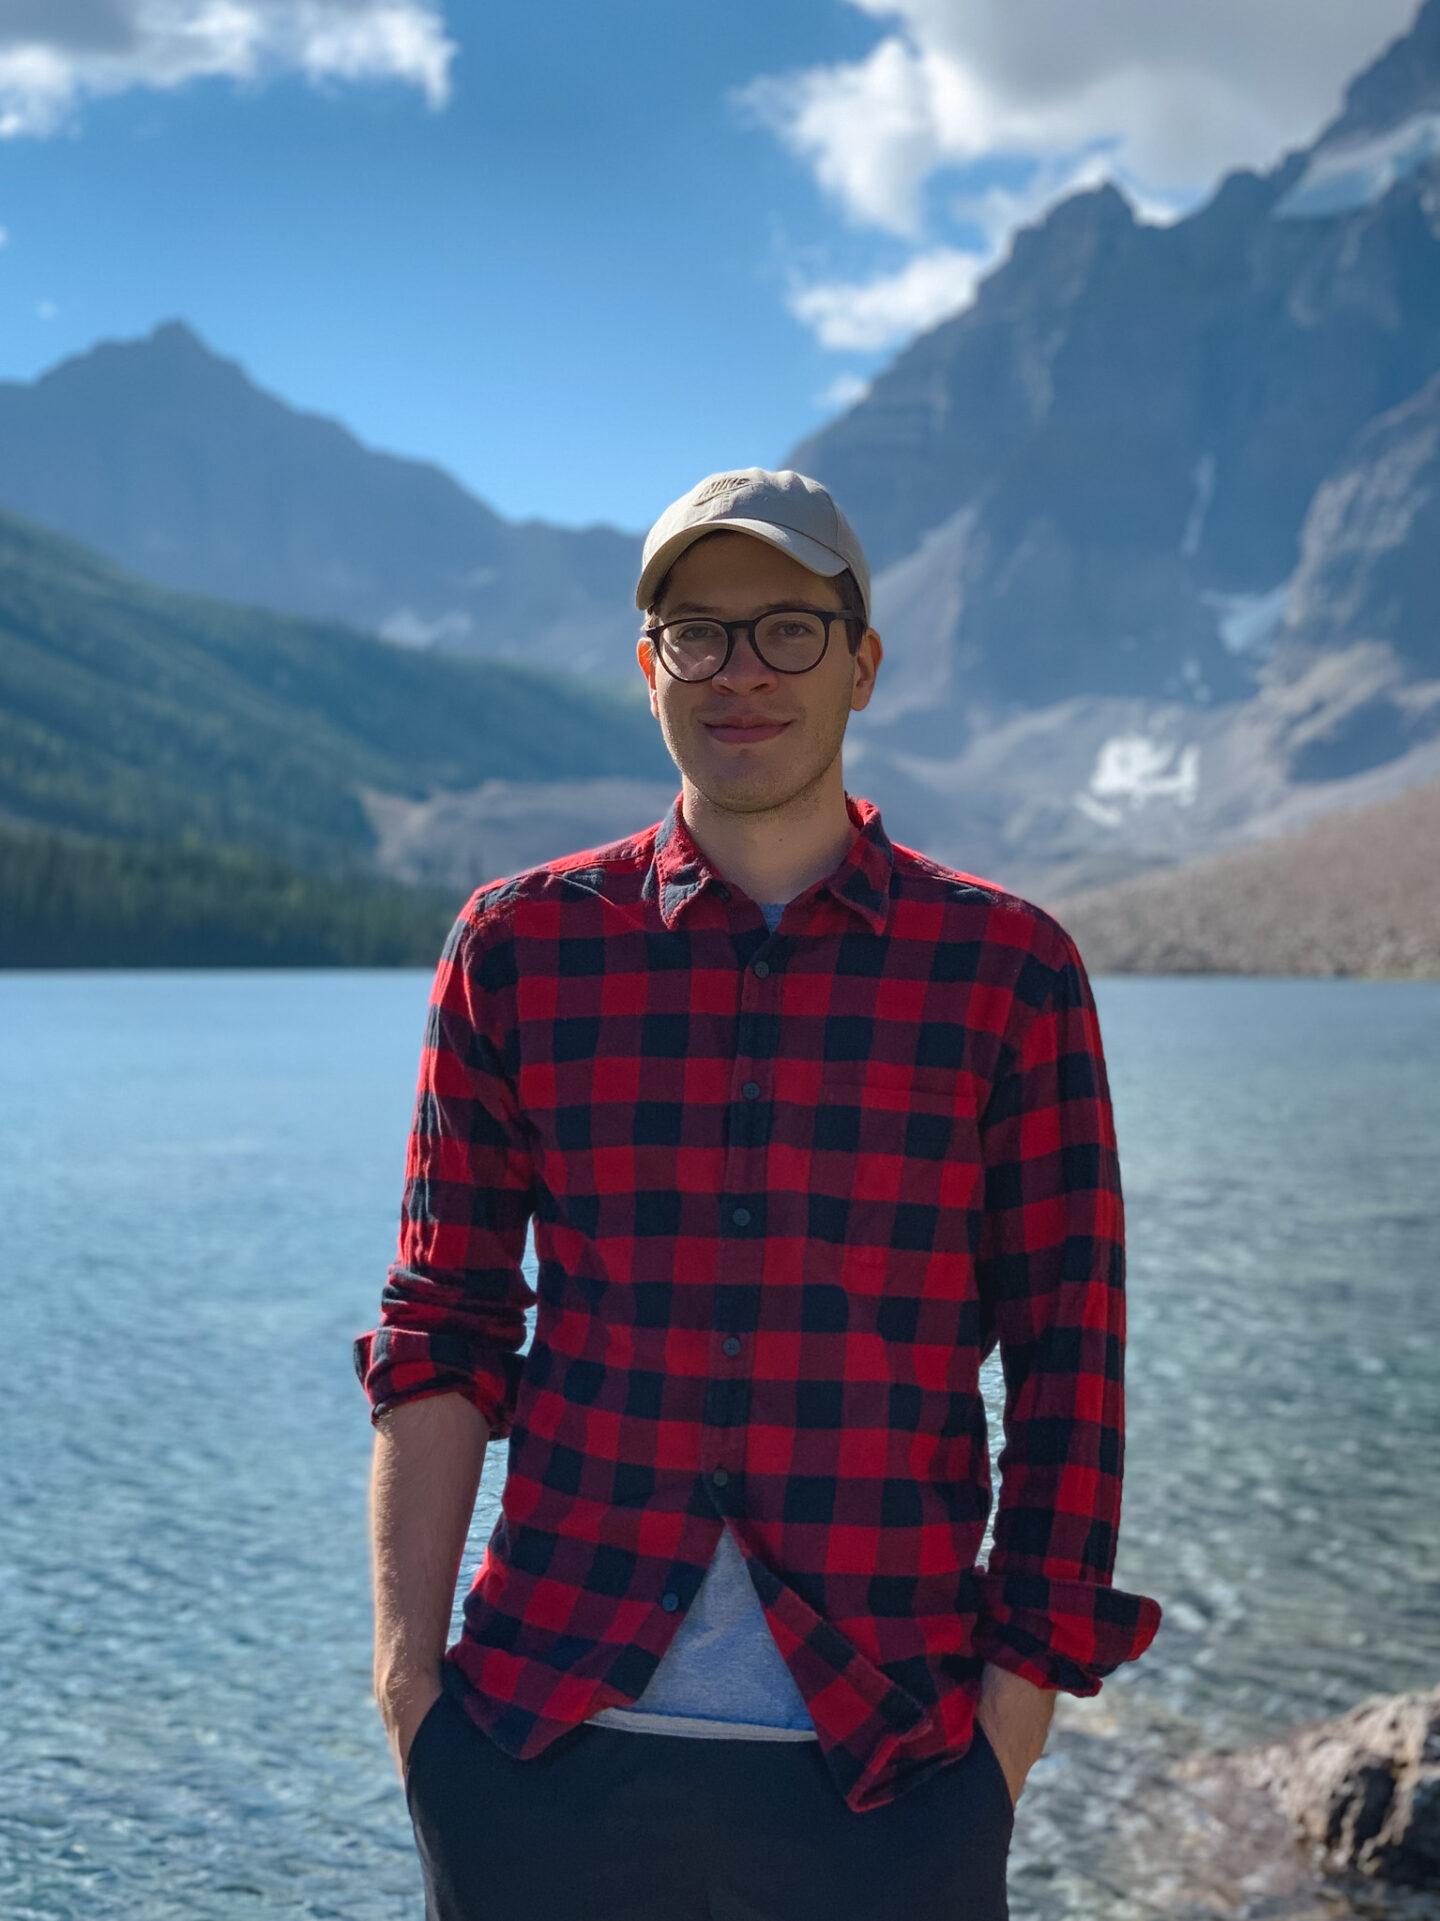 Consolation Lakes hiking trail in Banff, Alberta